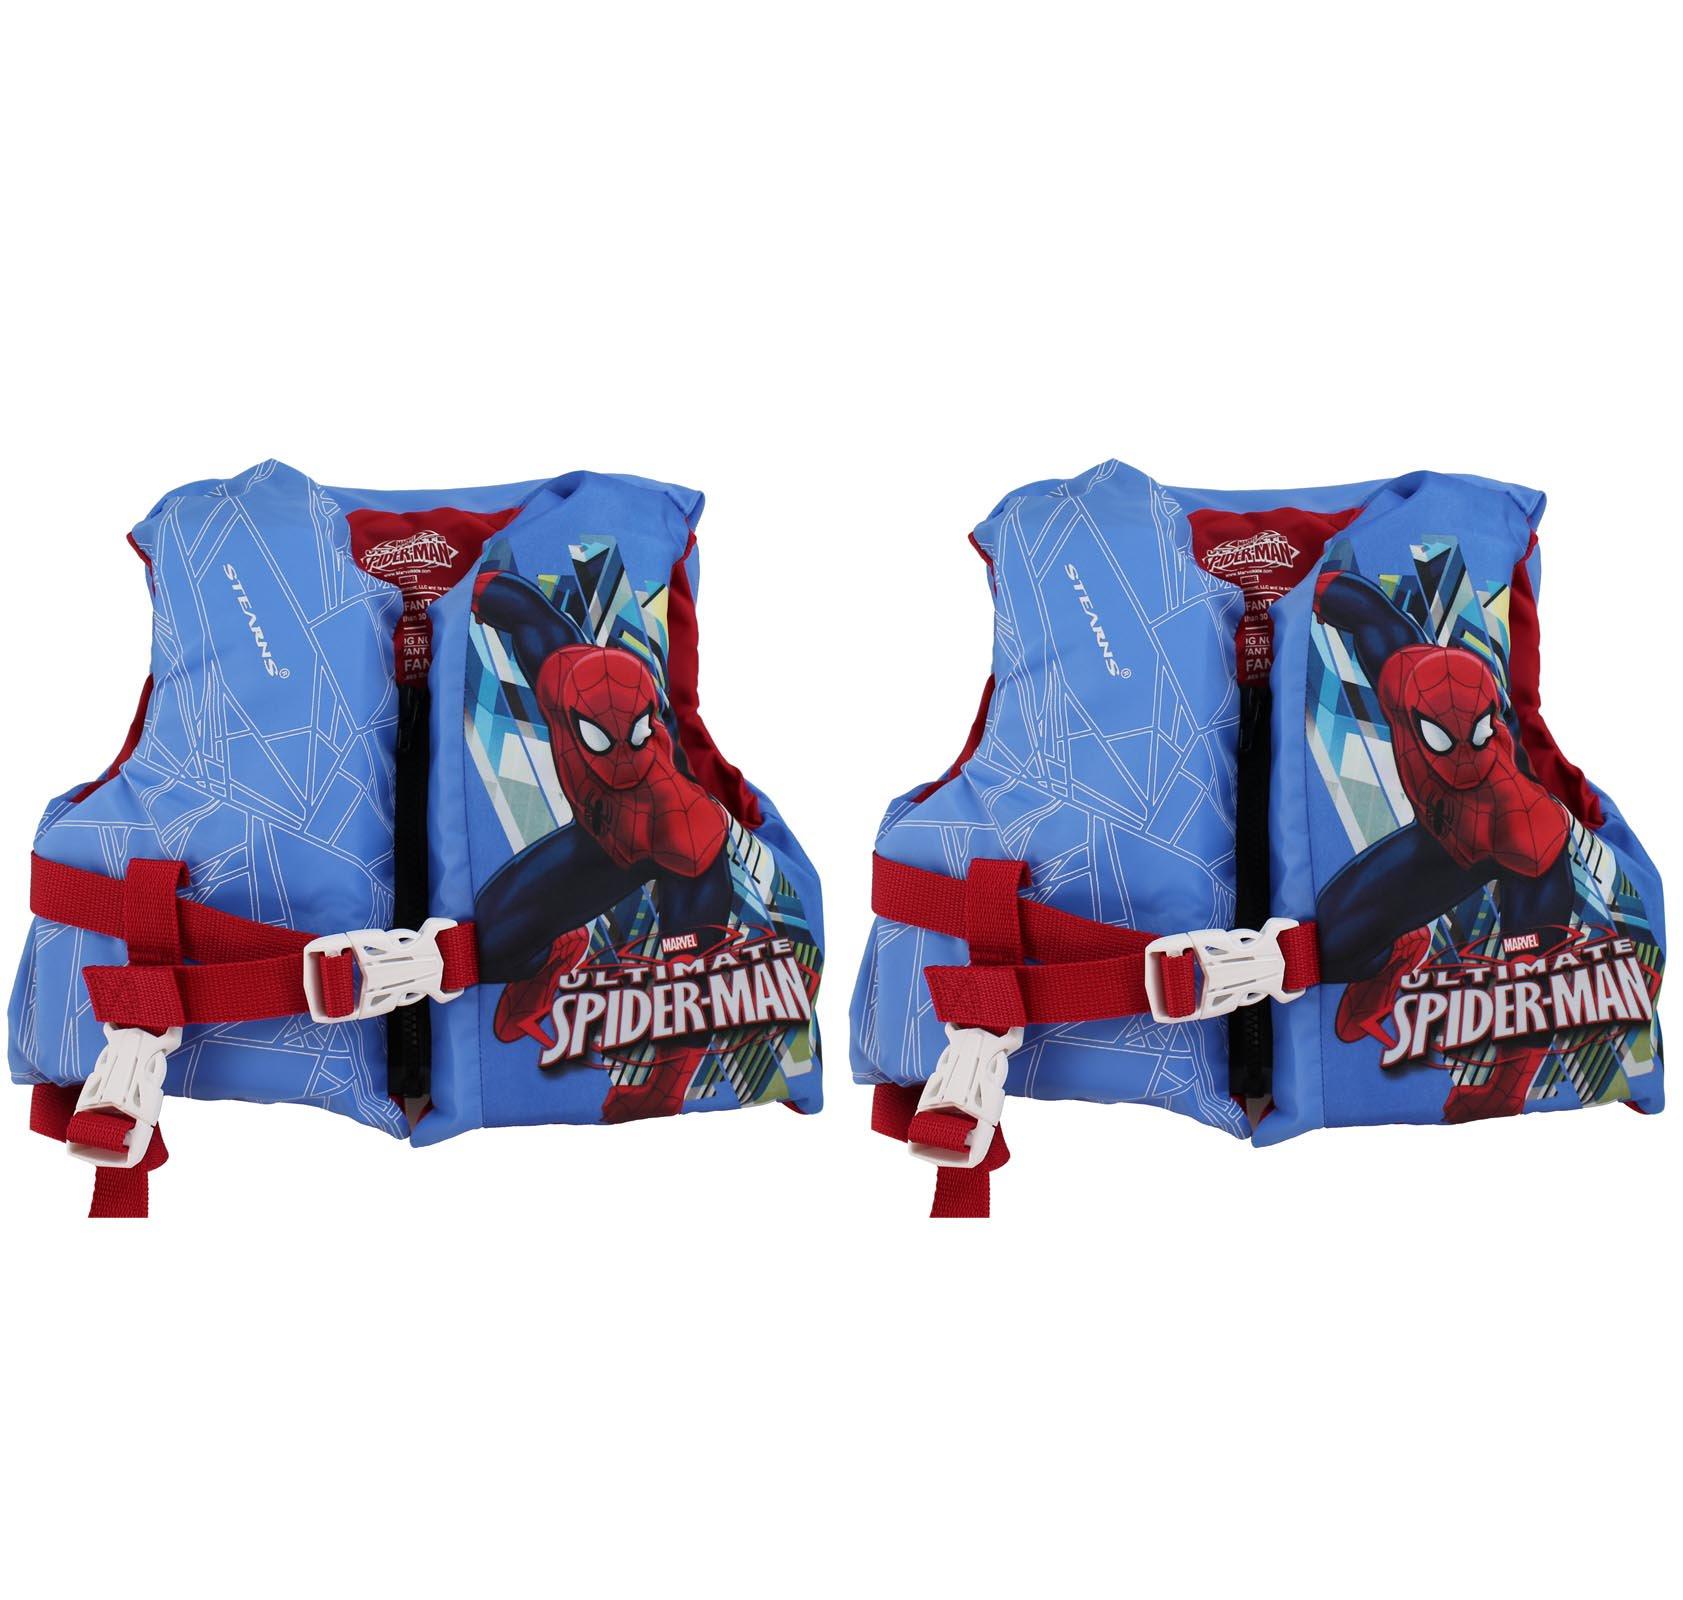 Coleman Stearns Spiderman Infant Pool Lake Life Jacket w/...